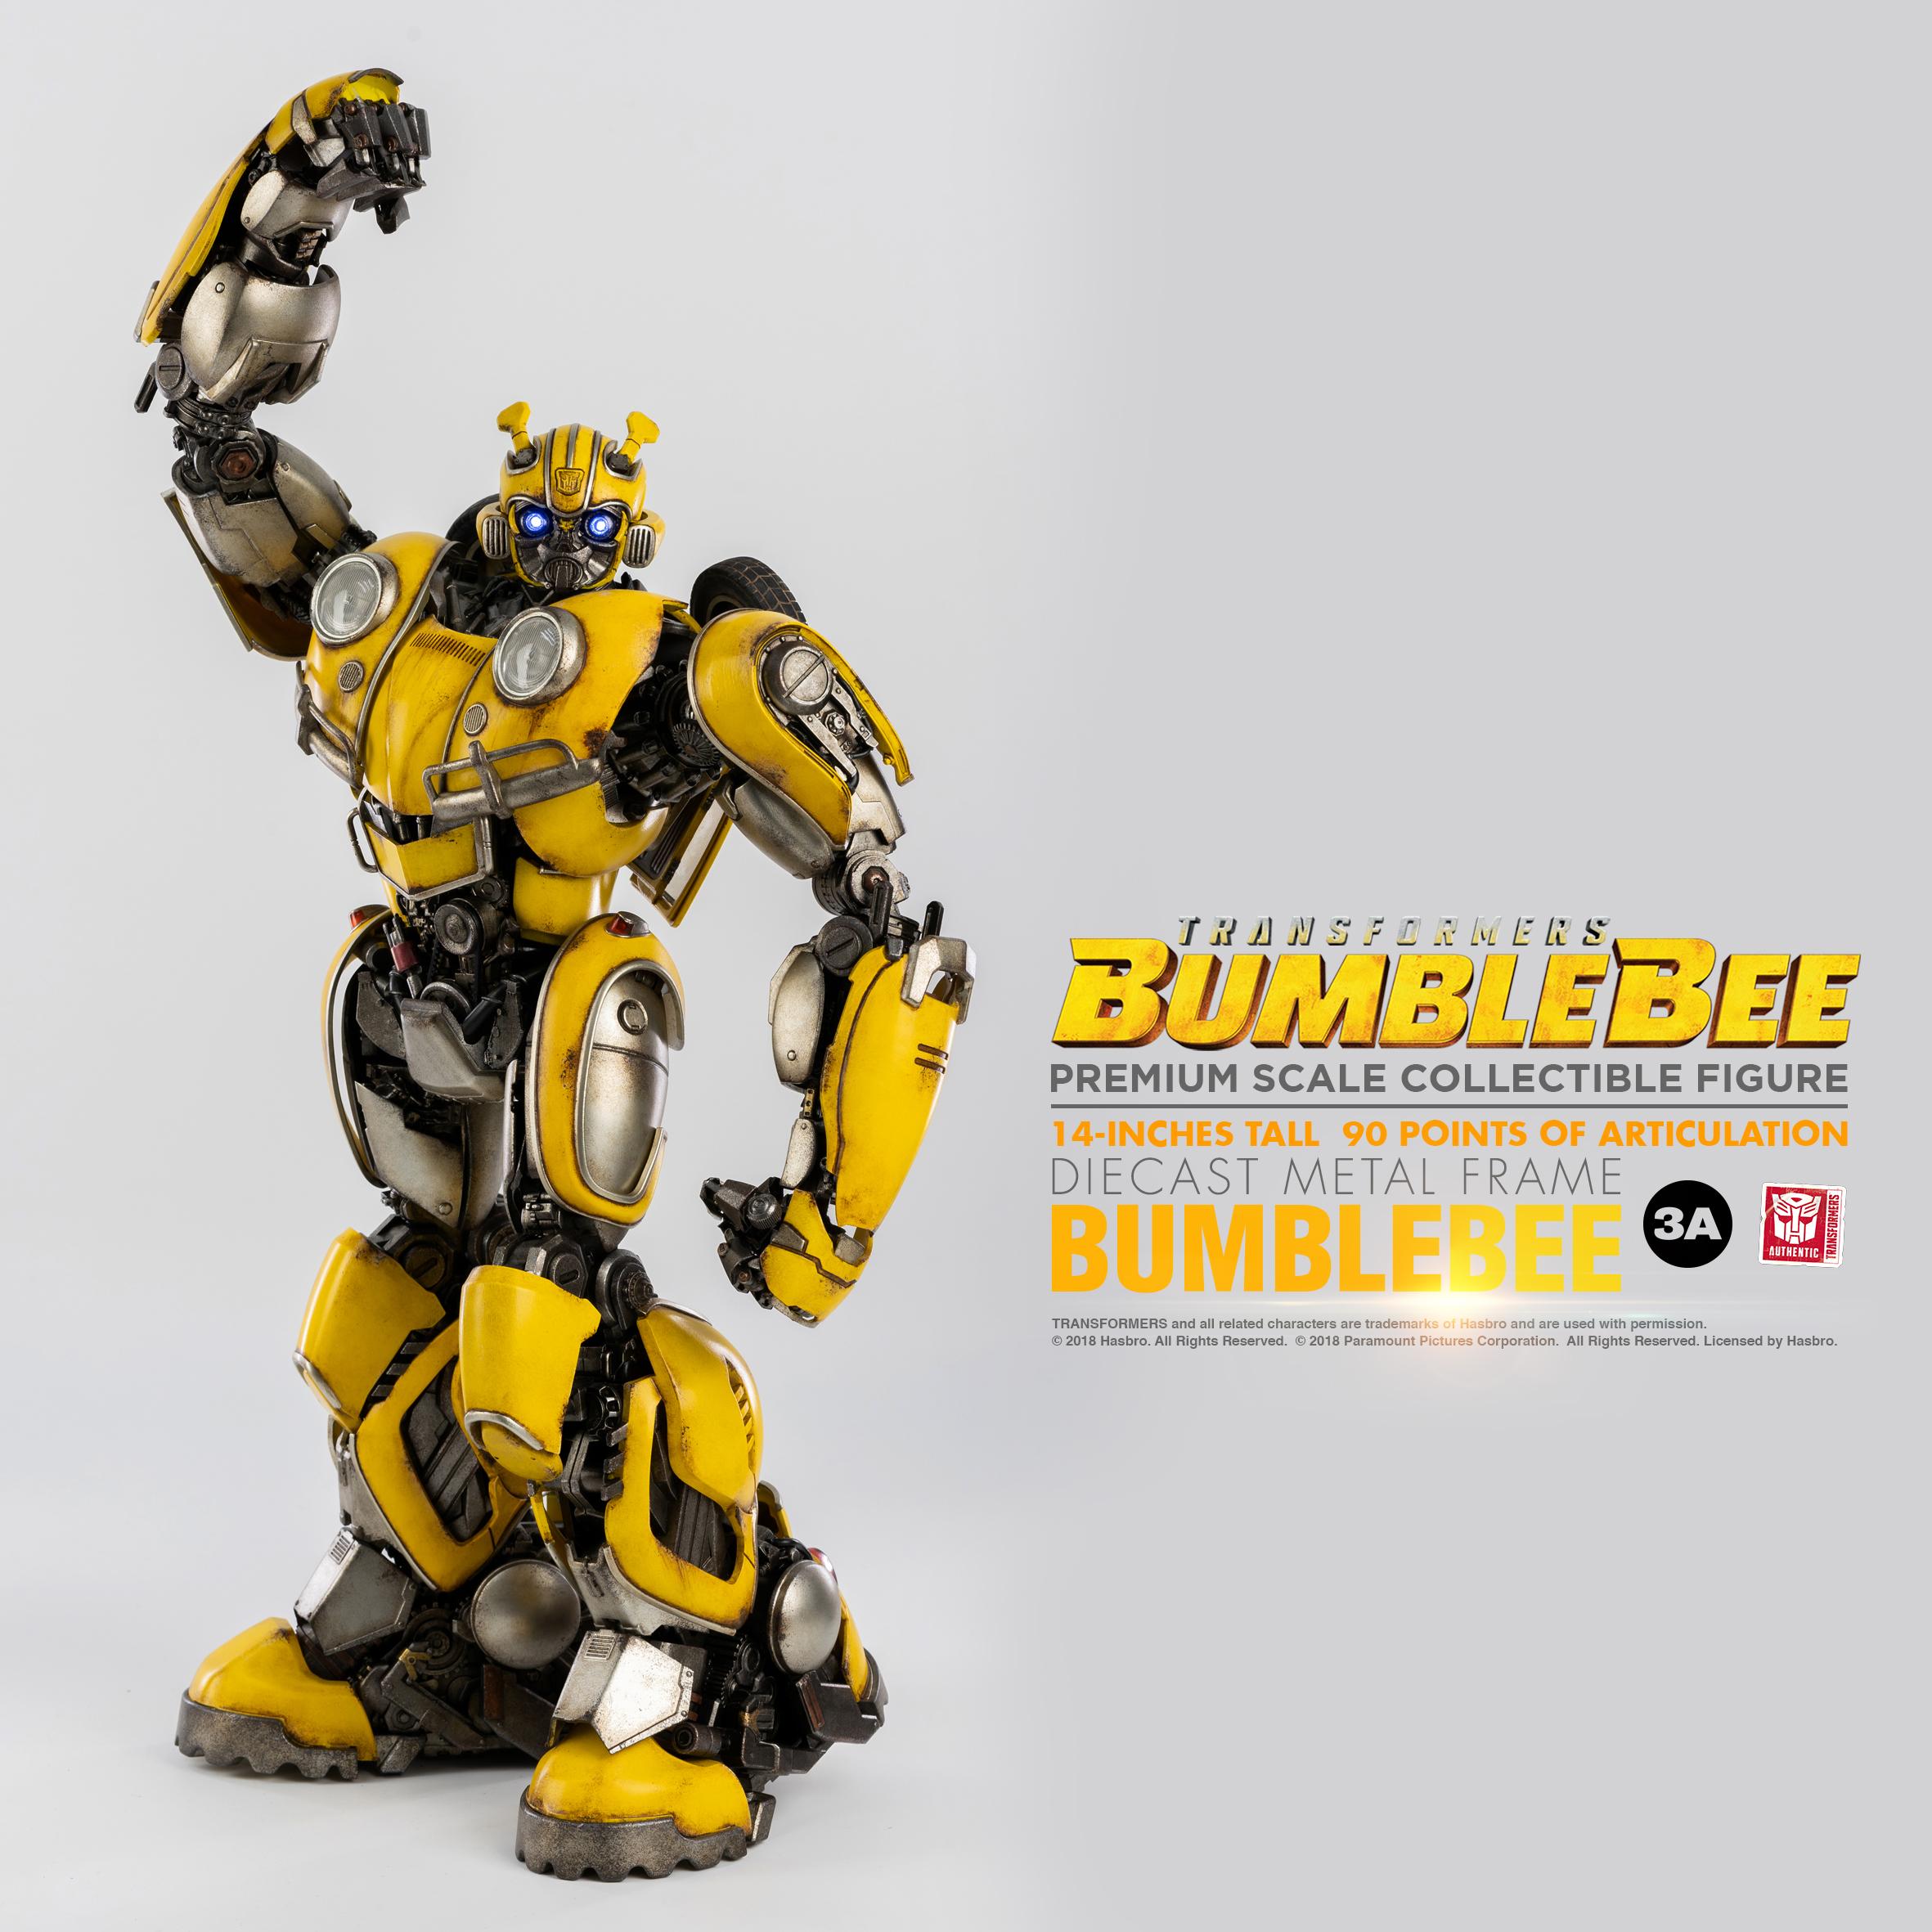 Bumblebee_ENG_PM_00008.jpg